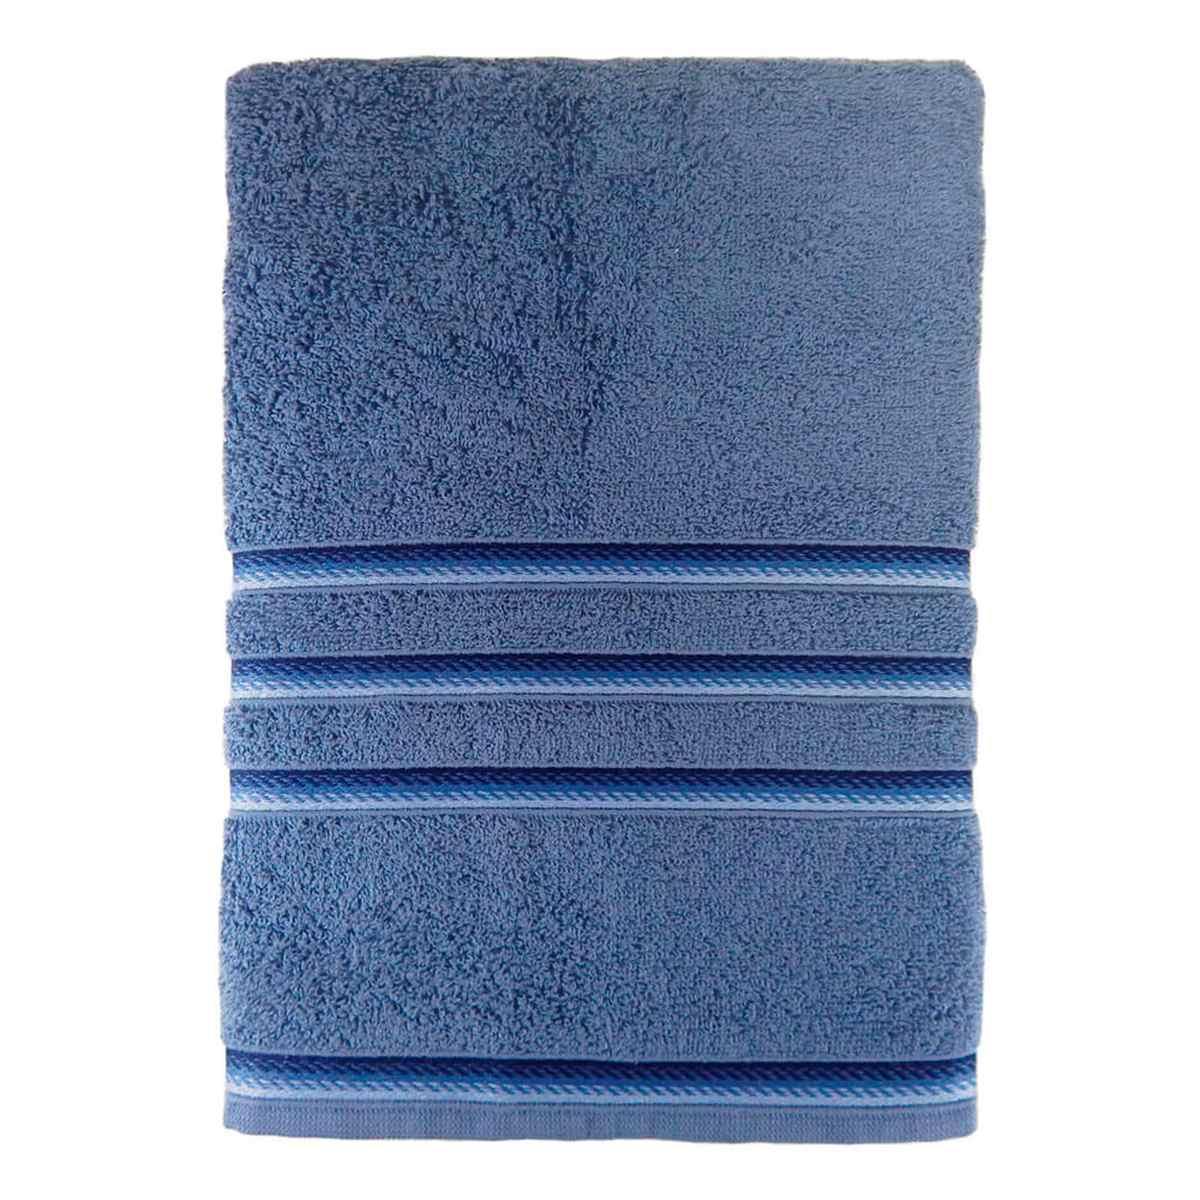 Toalha banhao classic 78x150 Azul Infinity